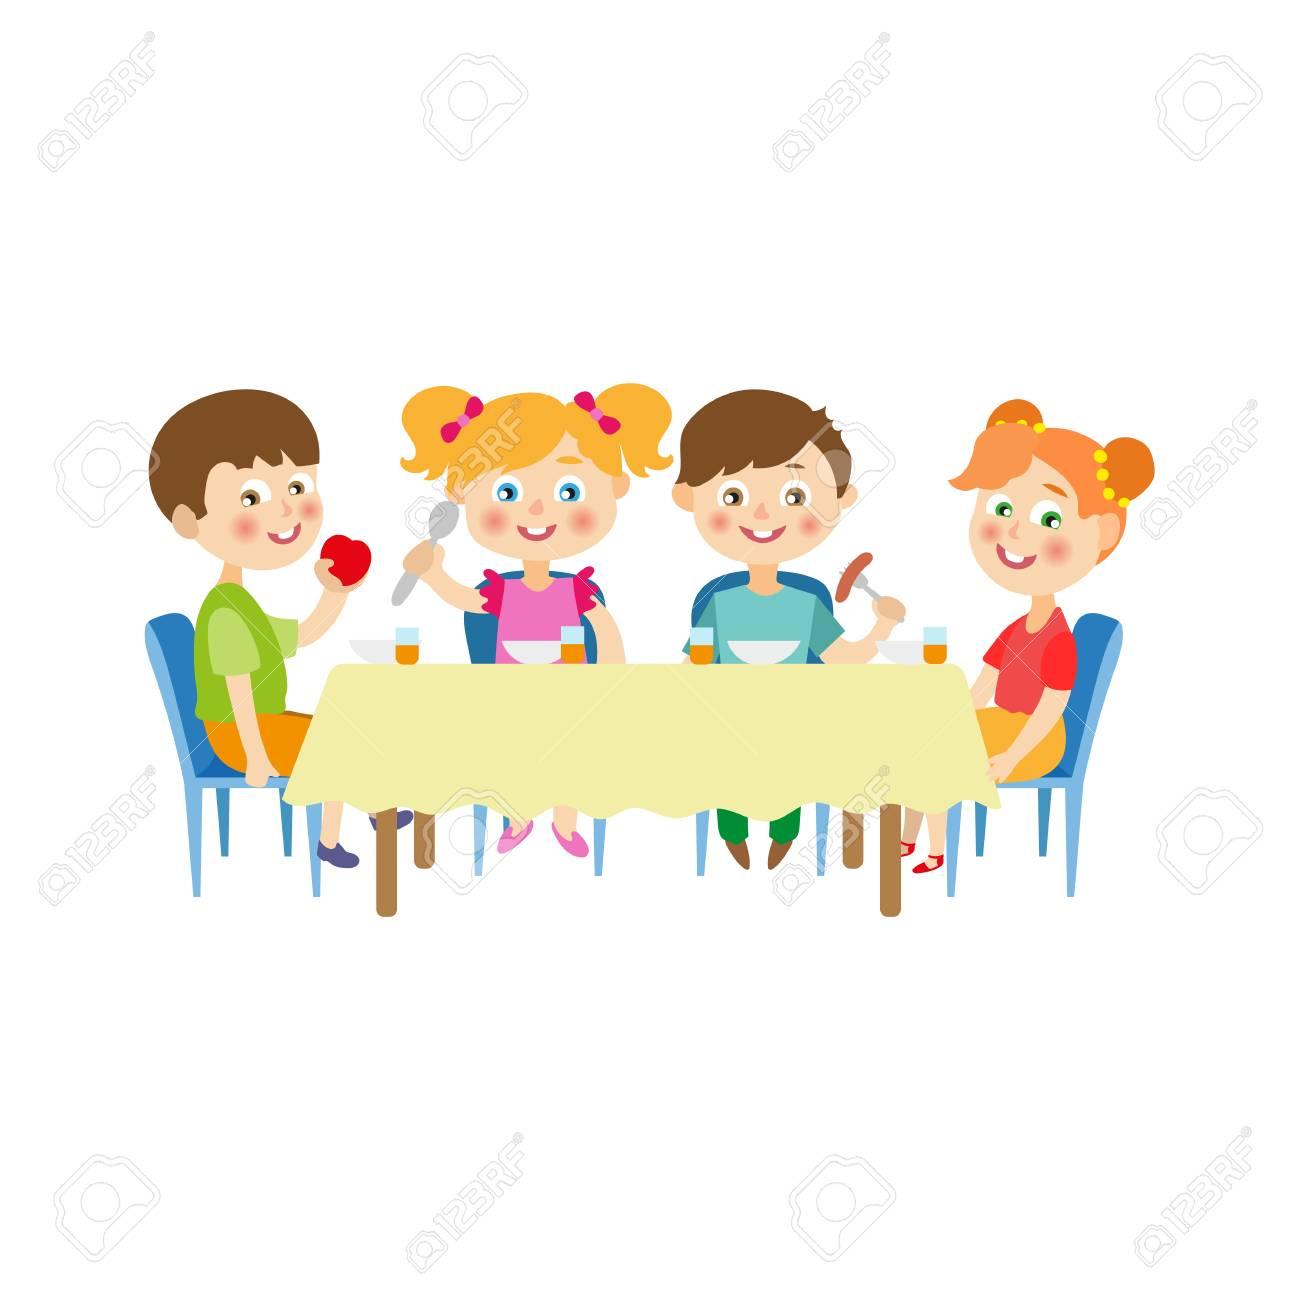 dsdsgog Foldable Educational,Cartoon Outer Space 55x83 for Girl Boys Daycare Preschool Lightweight